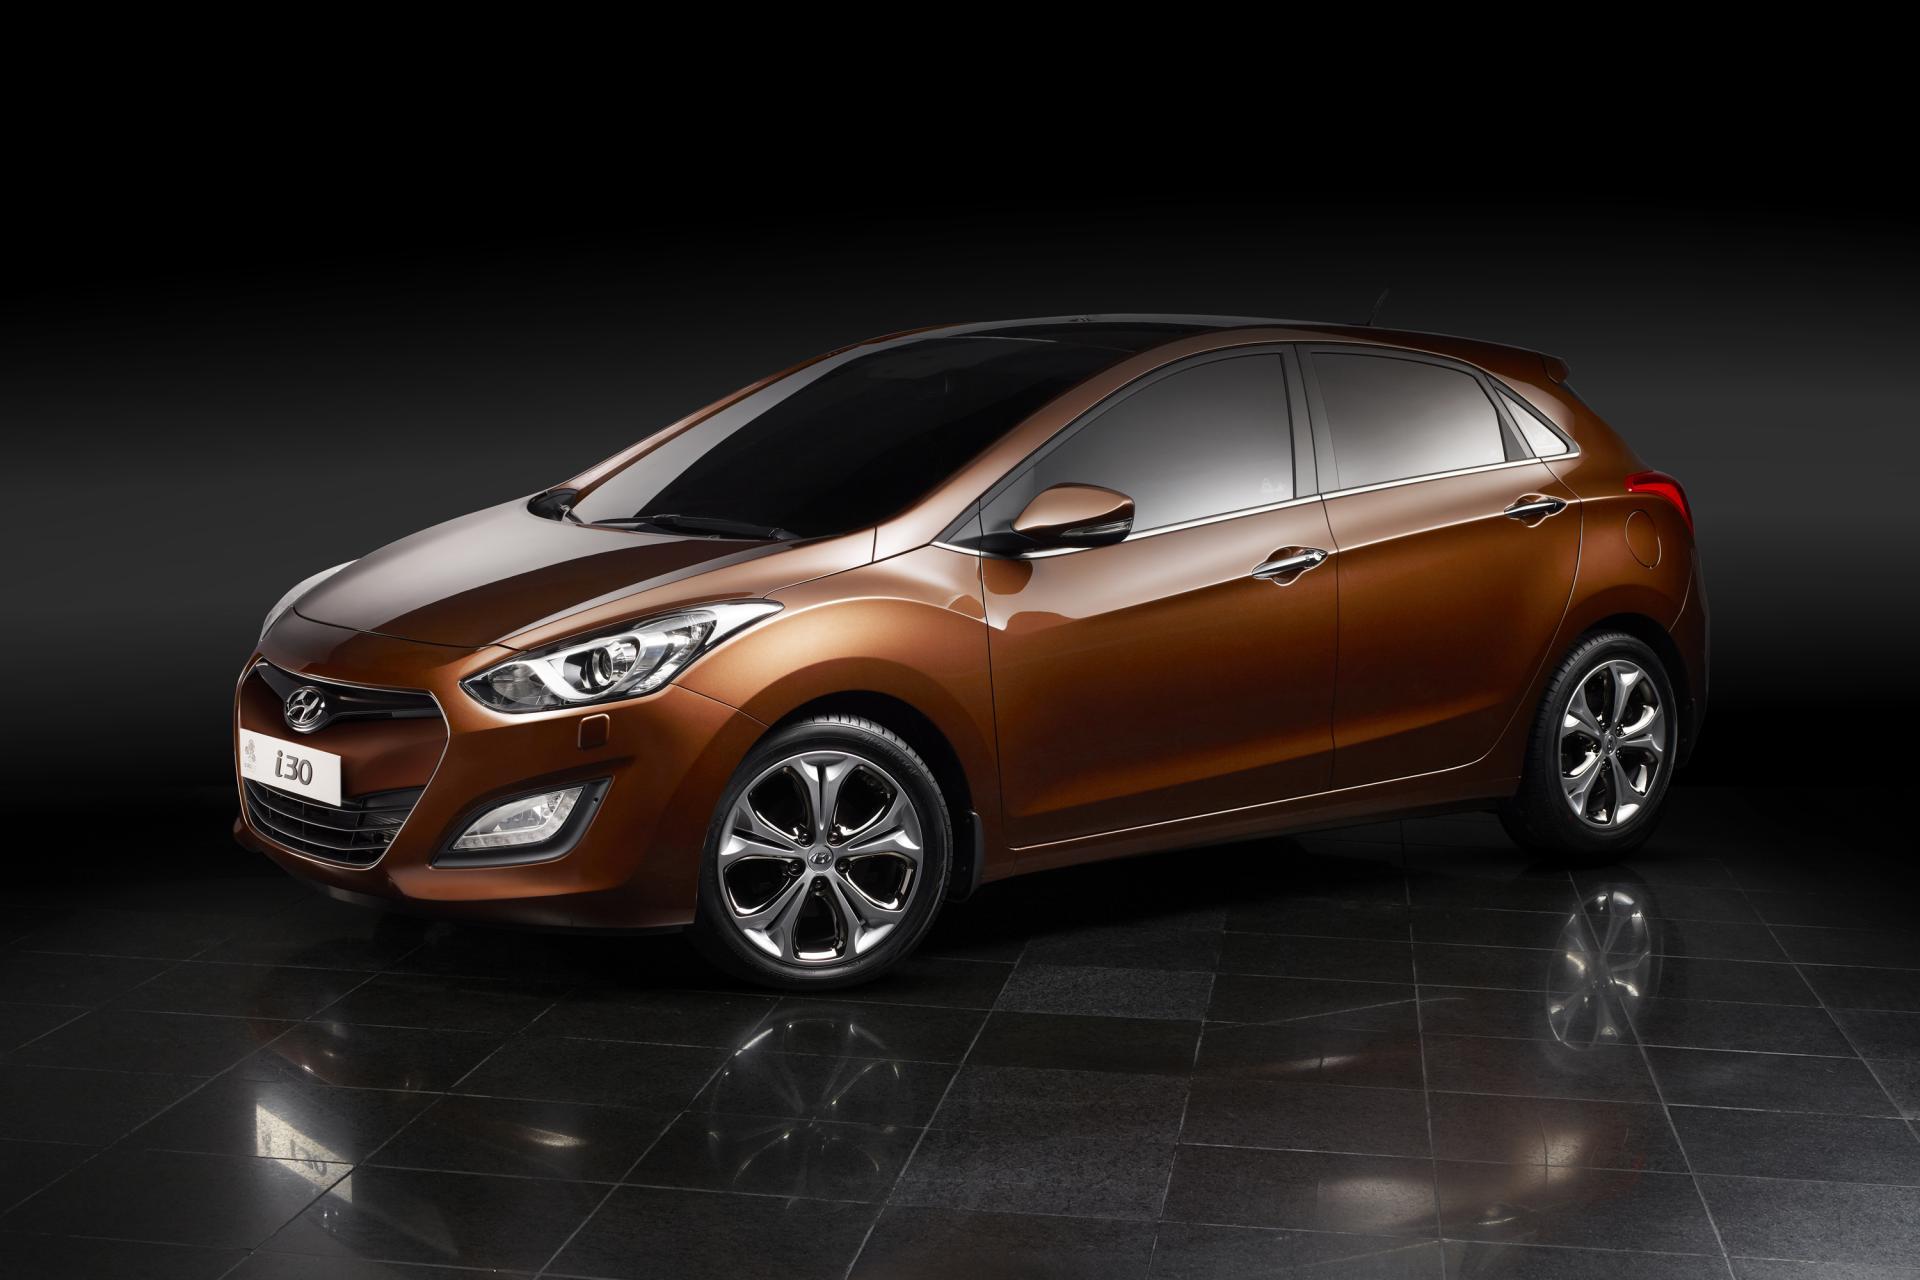 Hyundai i30: Kampfansage aus Südkorea